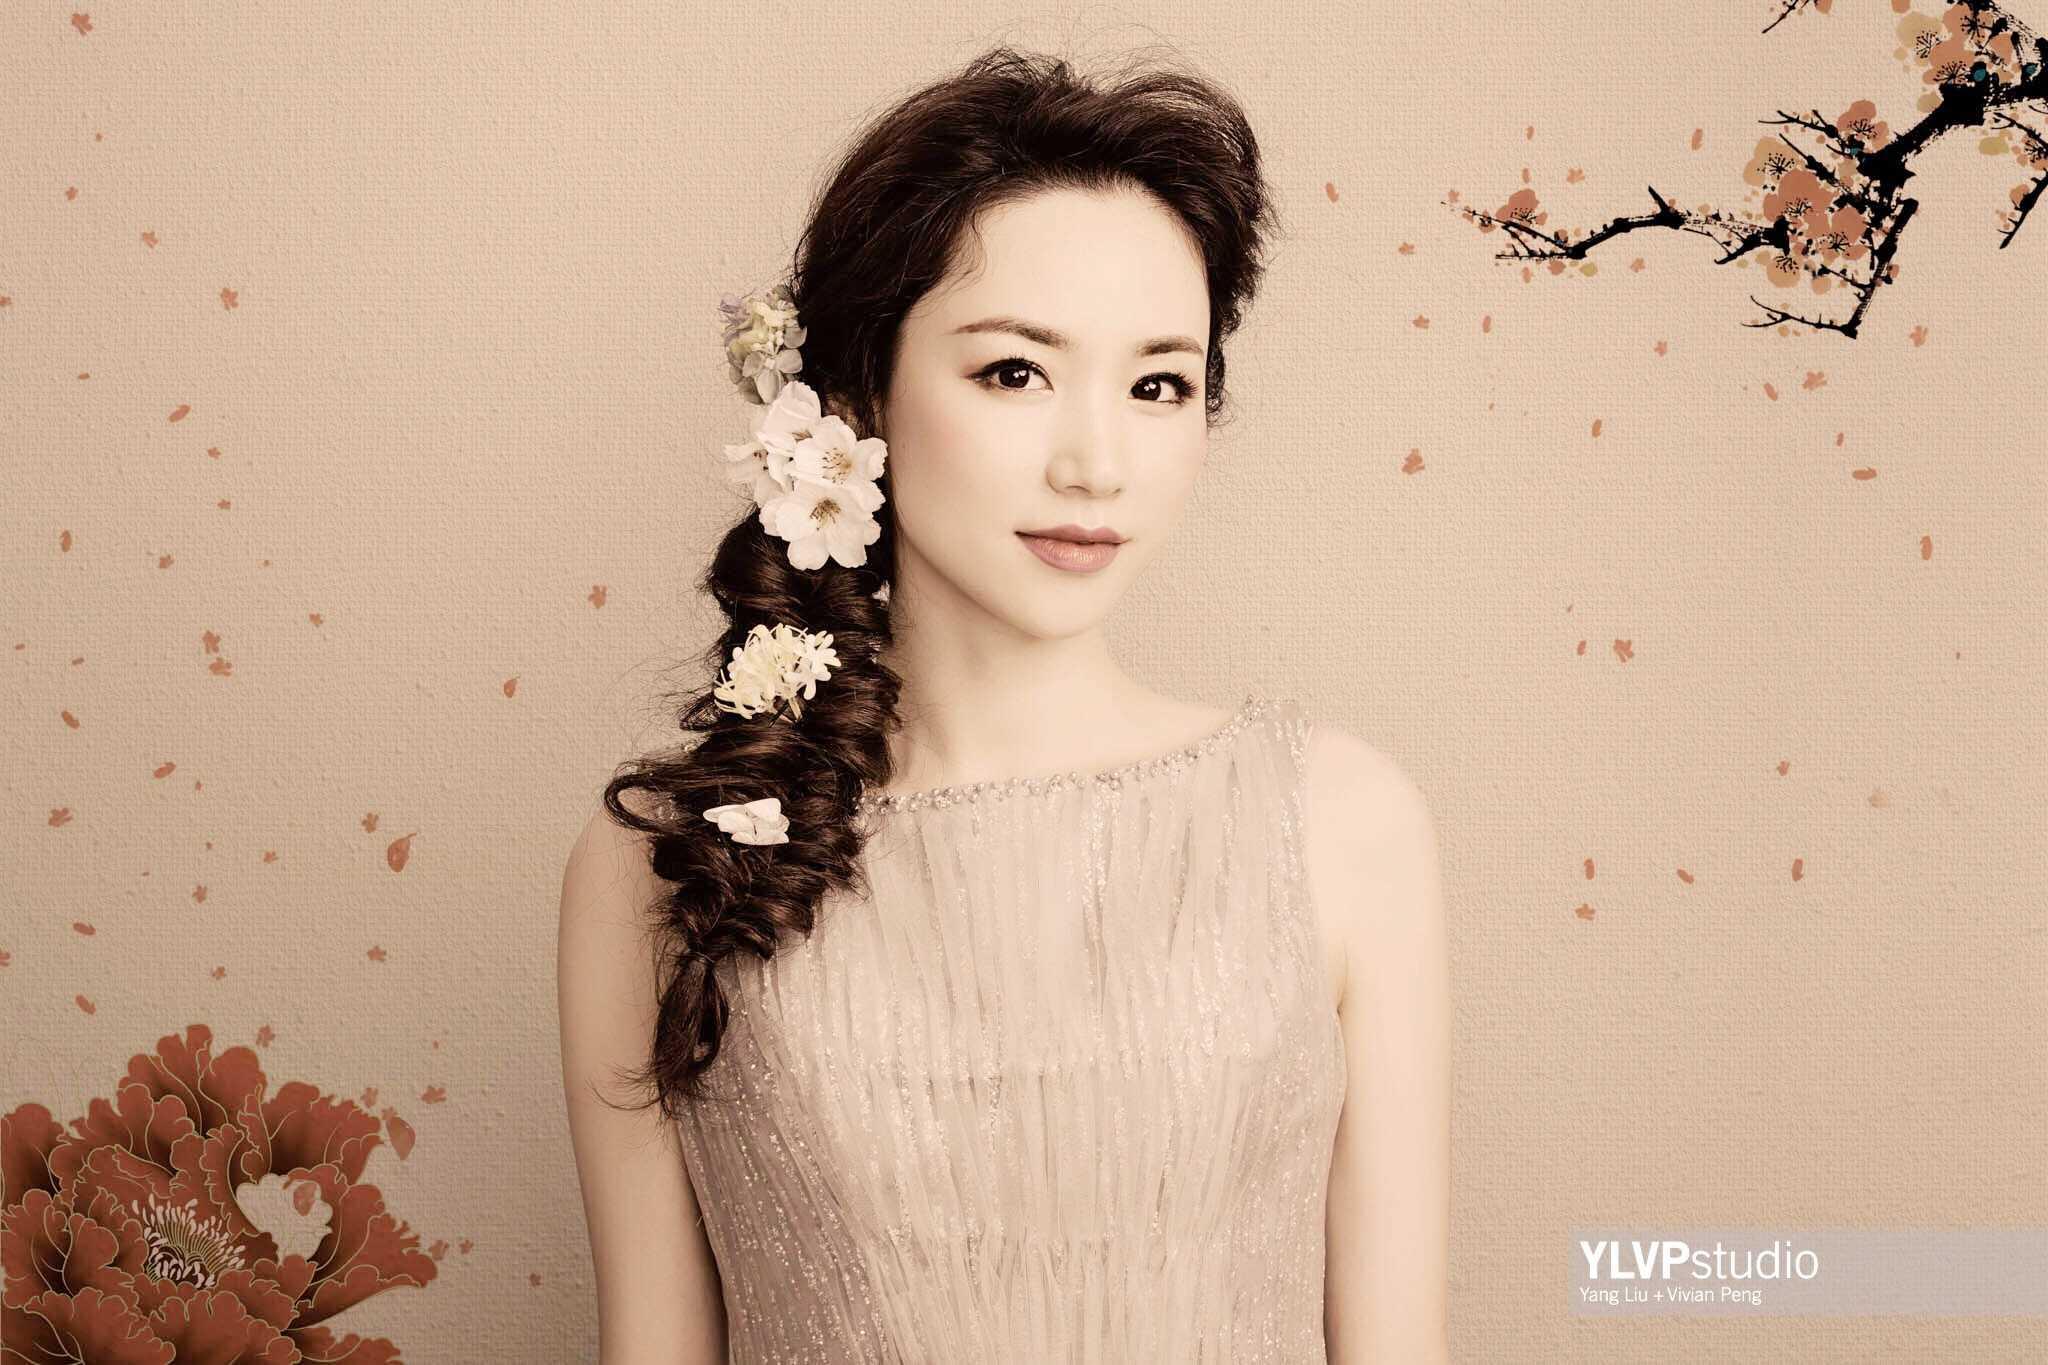 Gongbi style portrait ~ YLVP studio, Houston Portrait Photographer